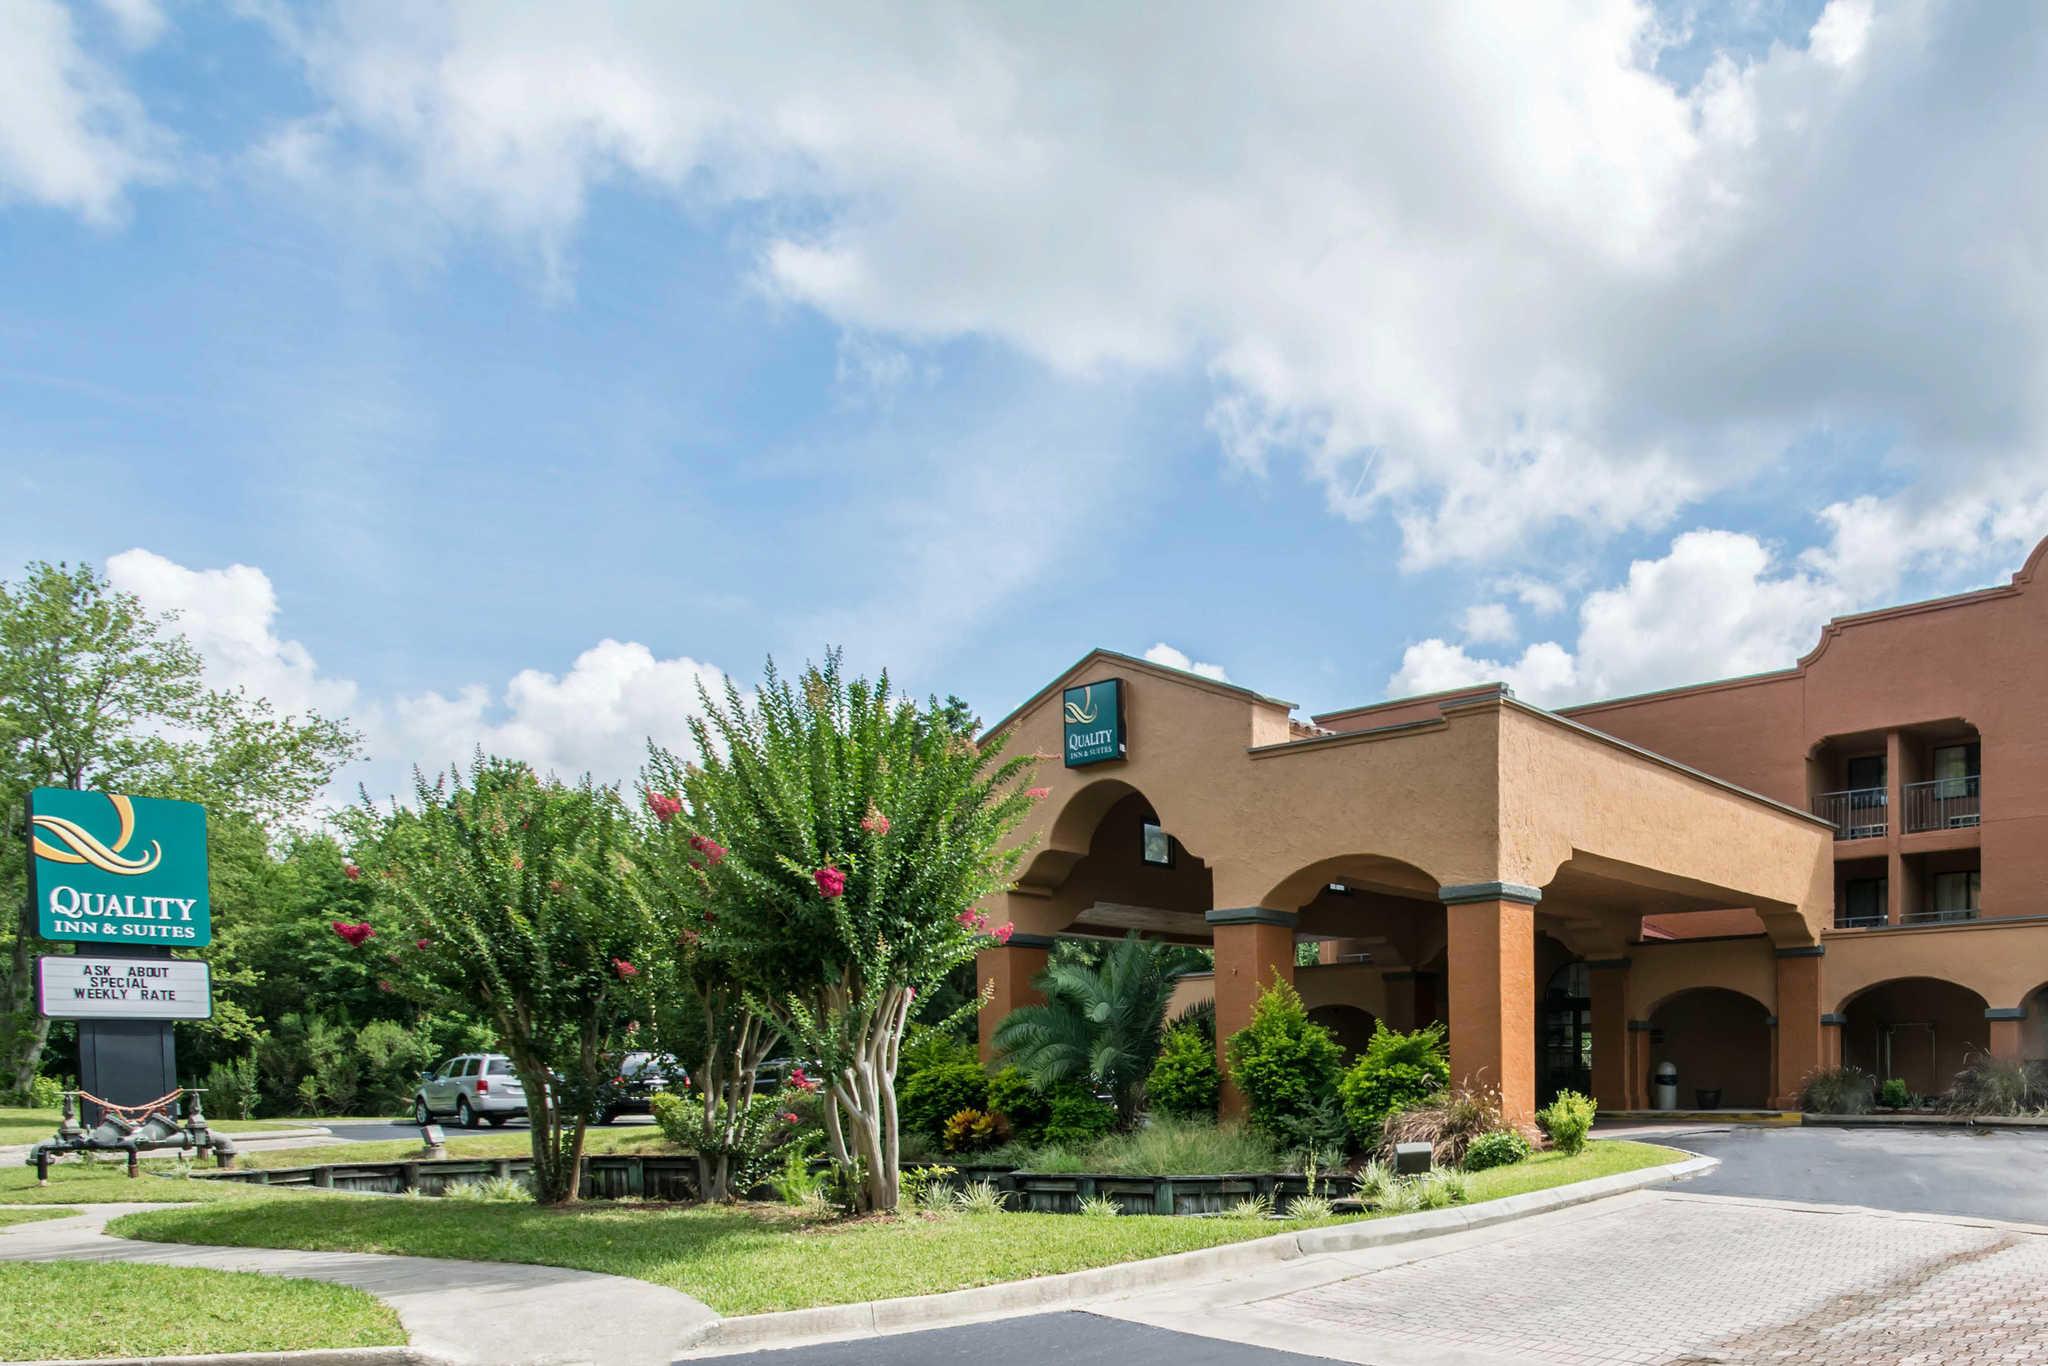 Quality Inn Amp Suites Jacksonville Florida Fl